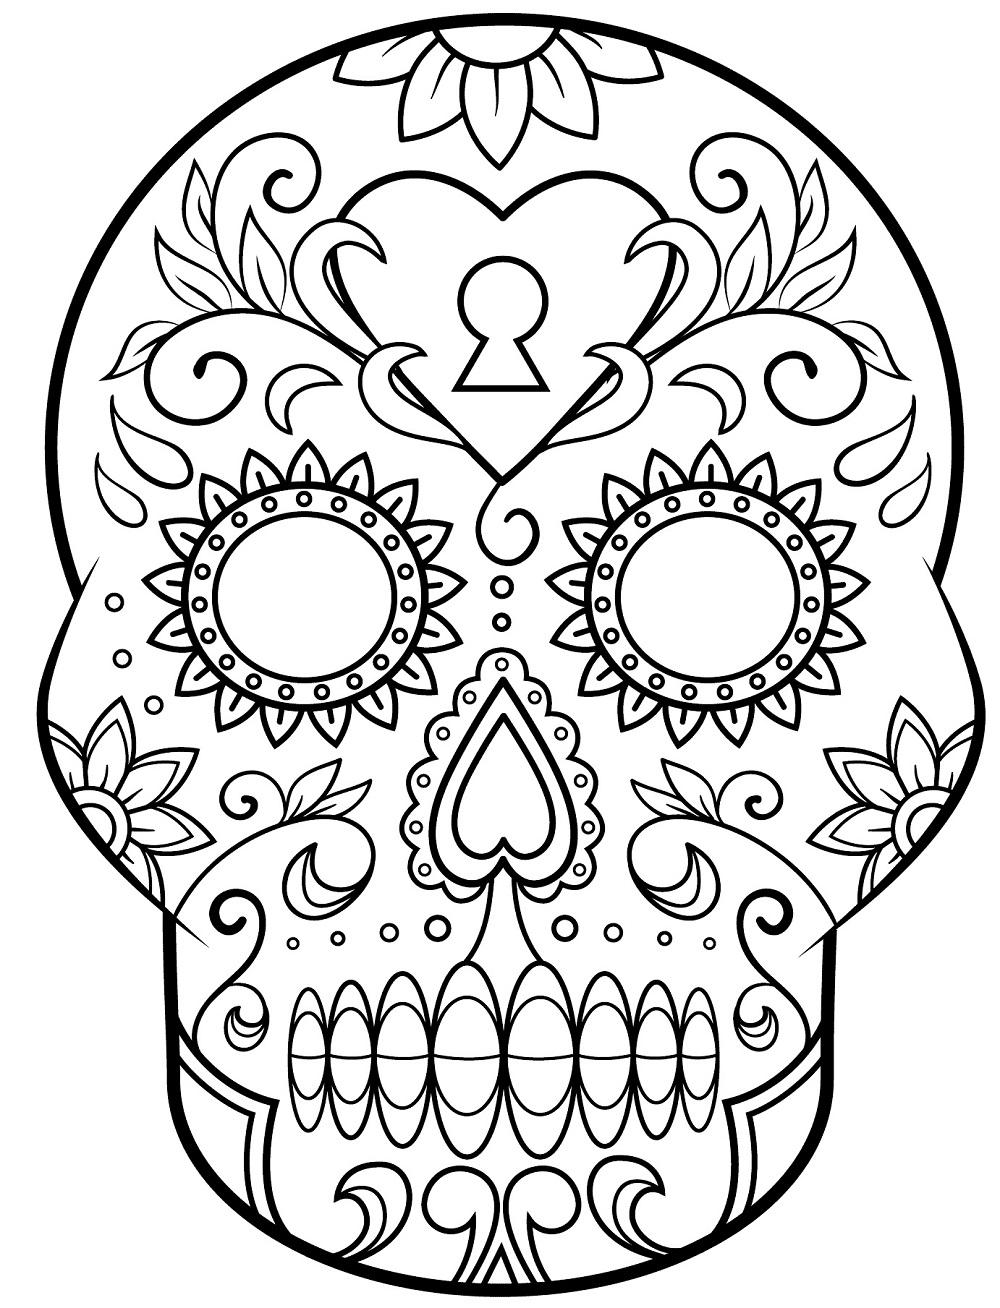 colorful sugar skull sugar skull coloring pages art is fun sugar colorful skull